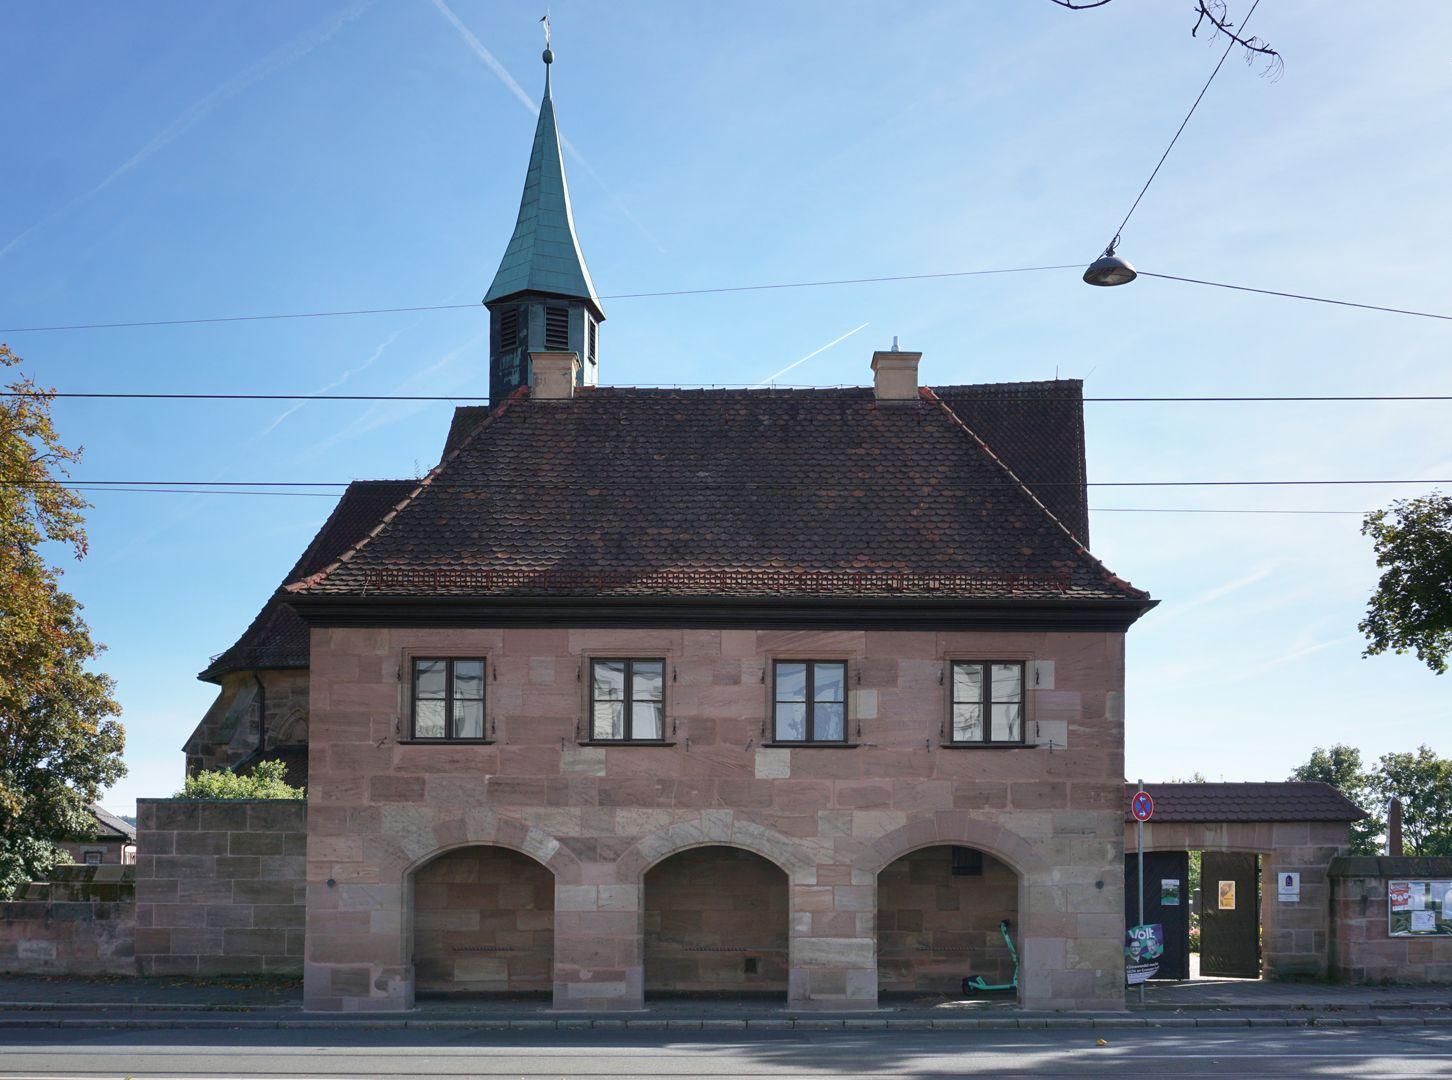 Pförtnerhaus des Friedhofs St. Jobst Nordseite